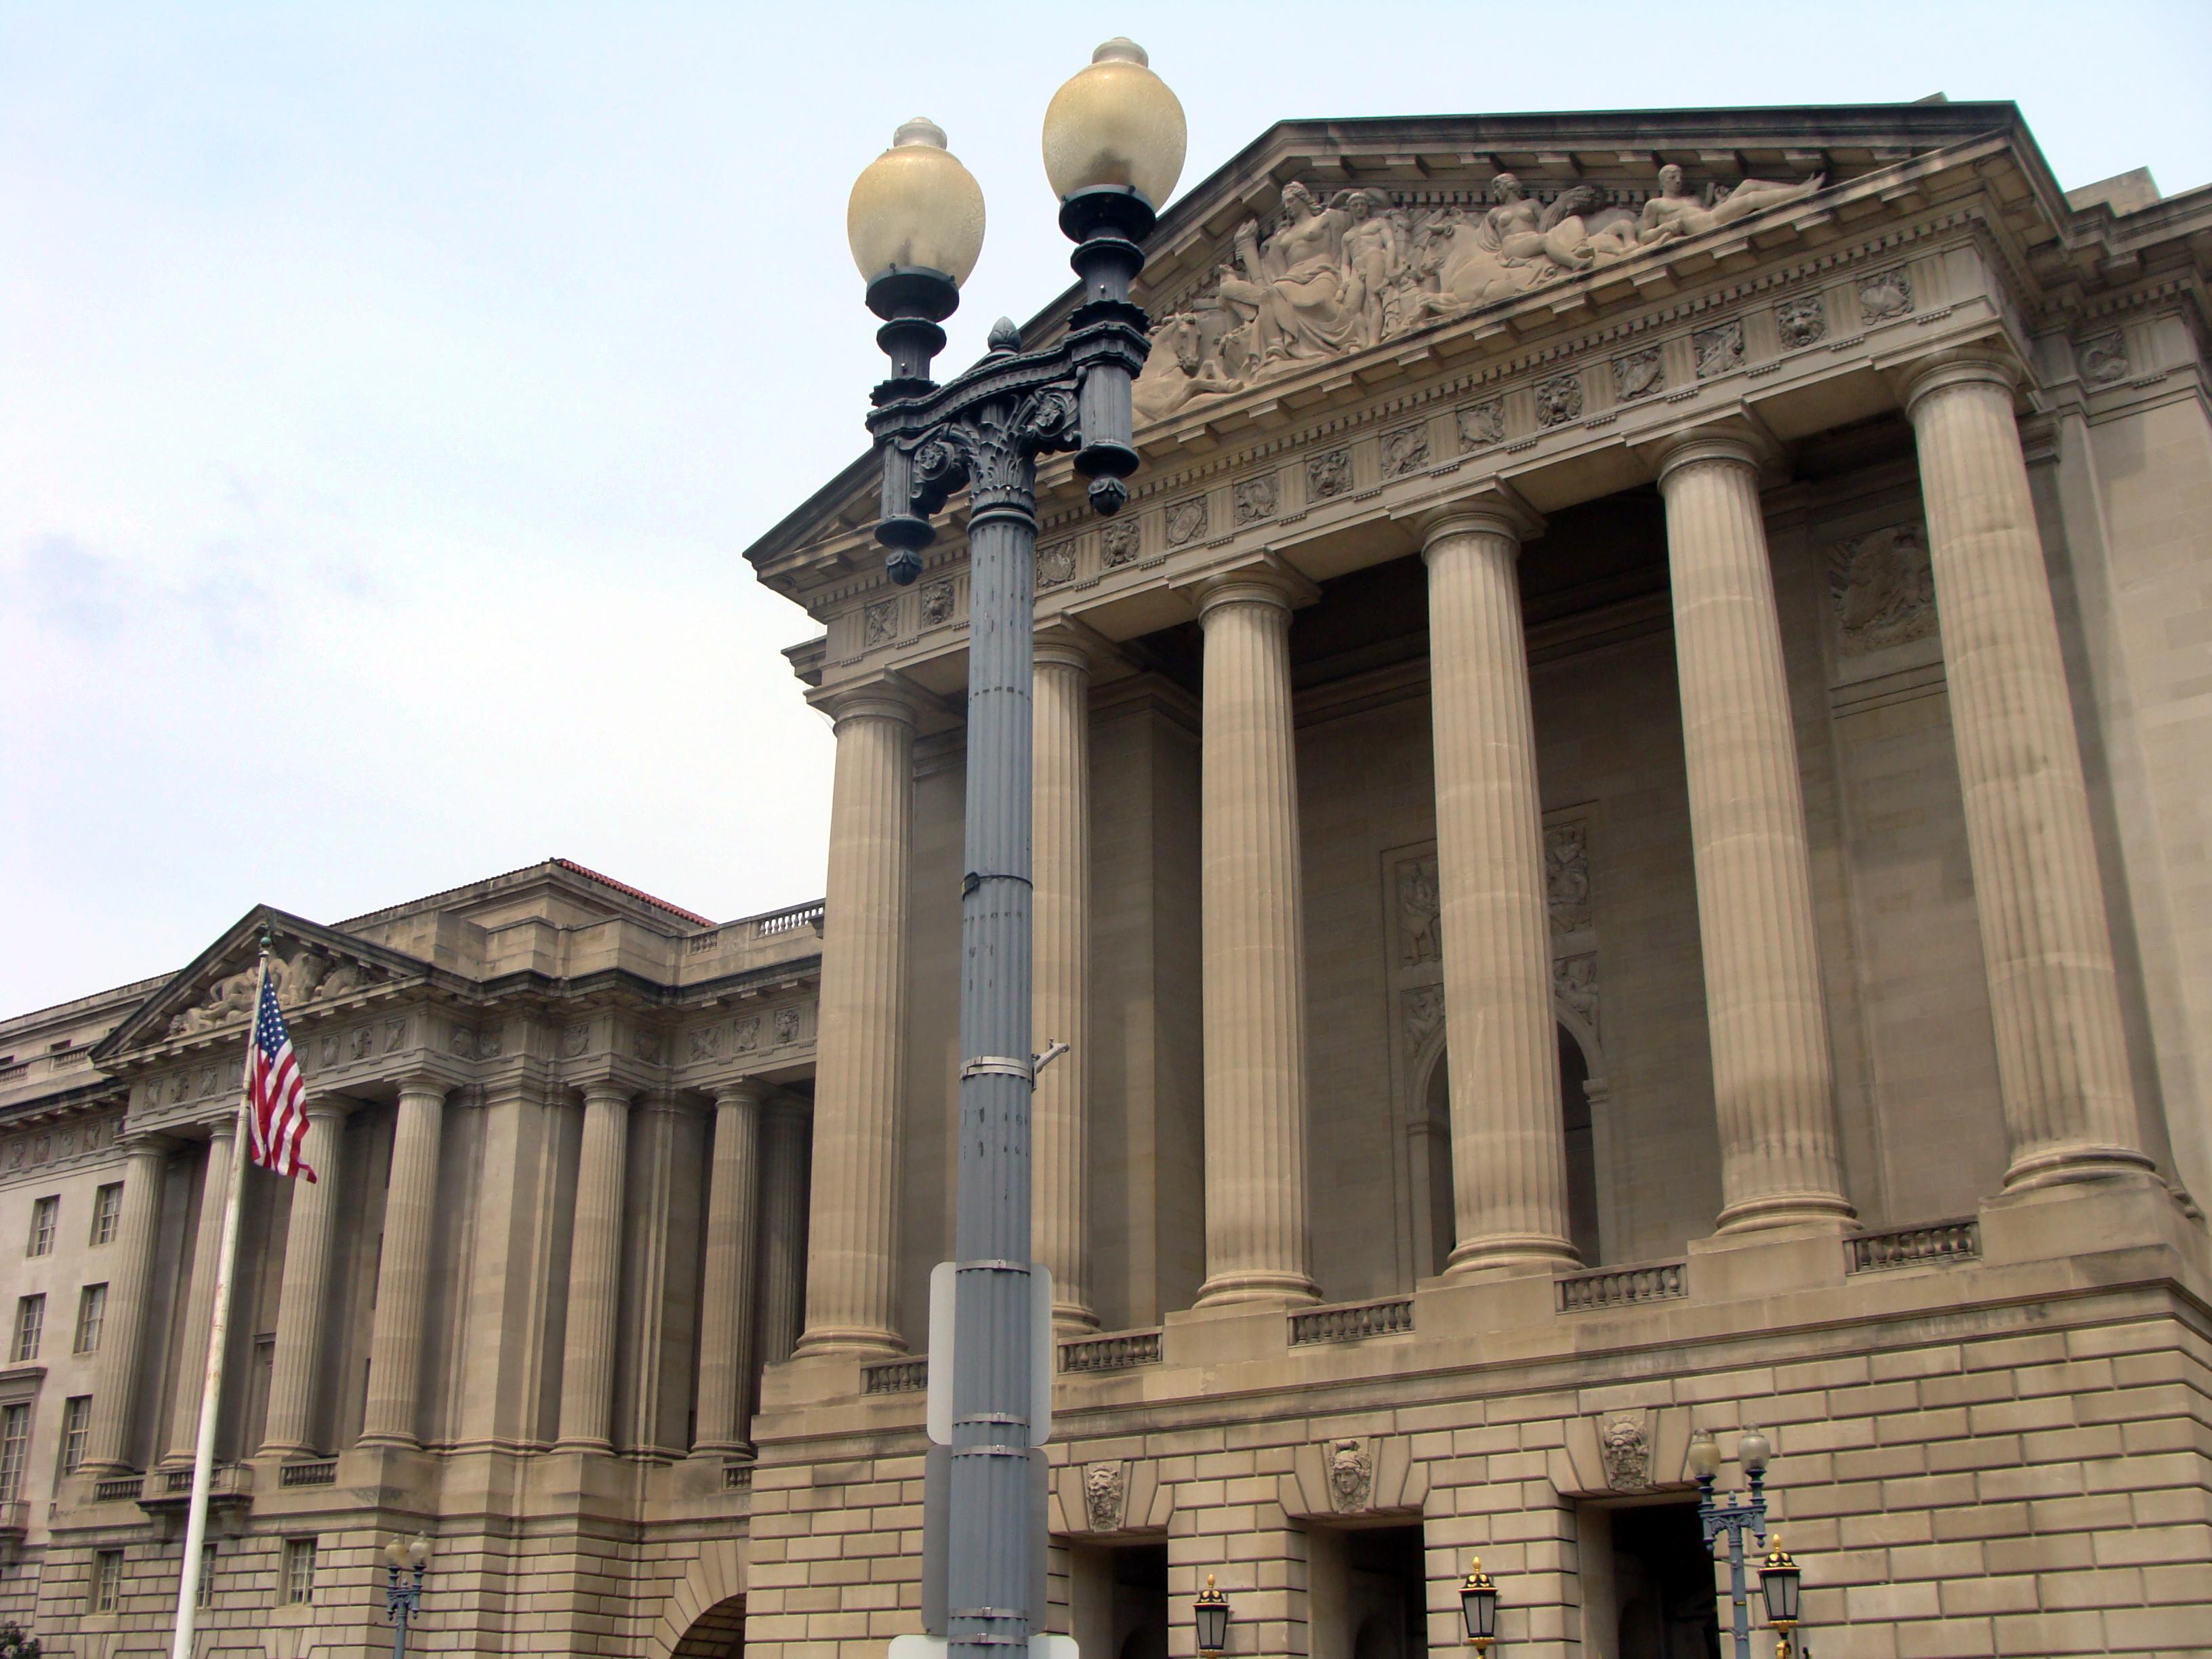 File:Washington DC Constitution Blvd Government Buildings.jpg